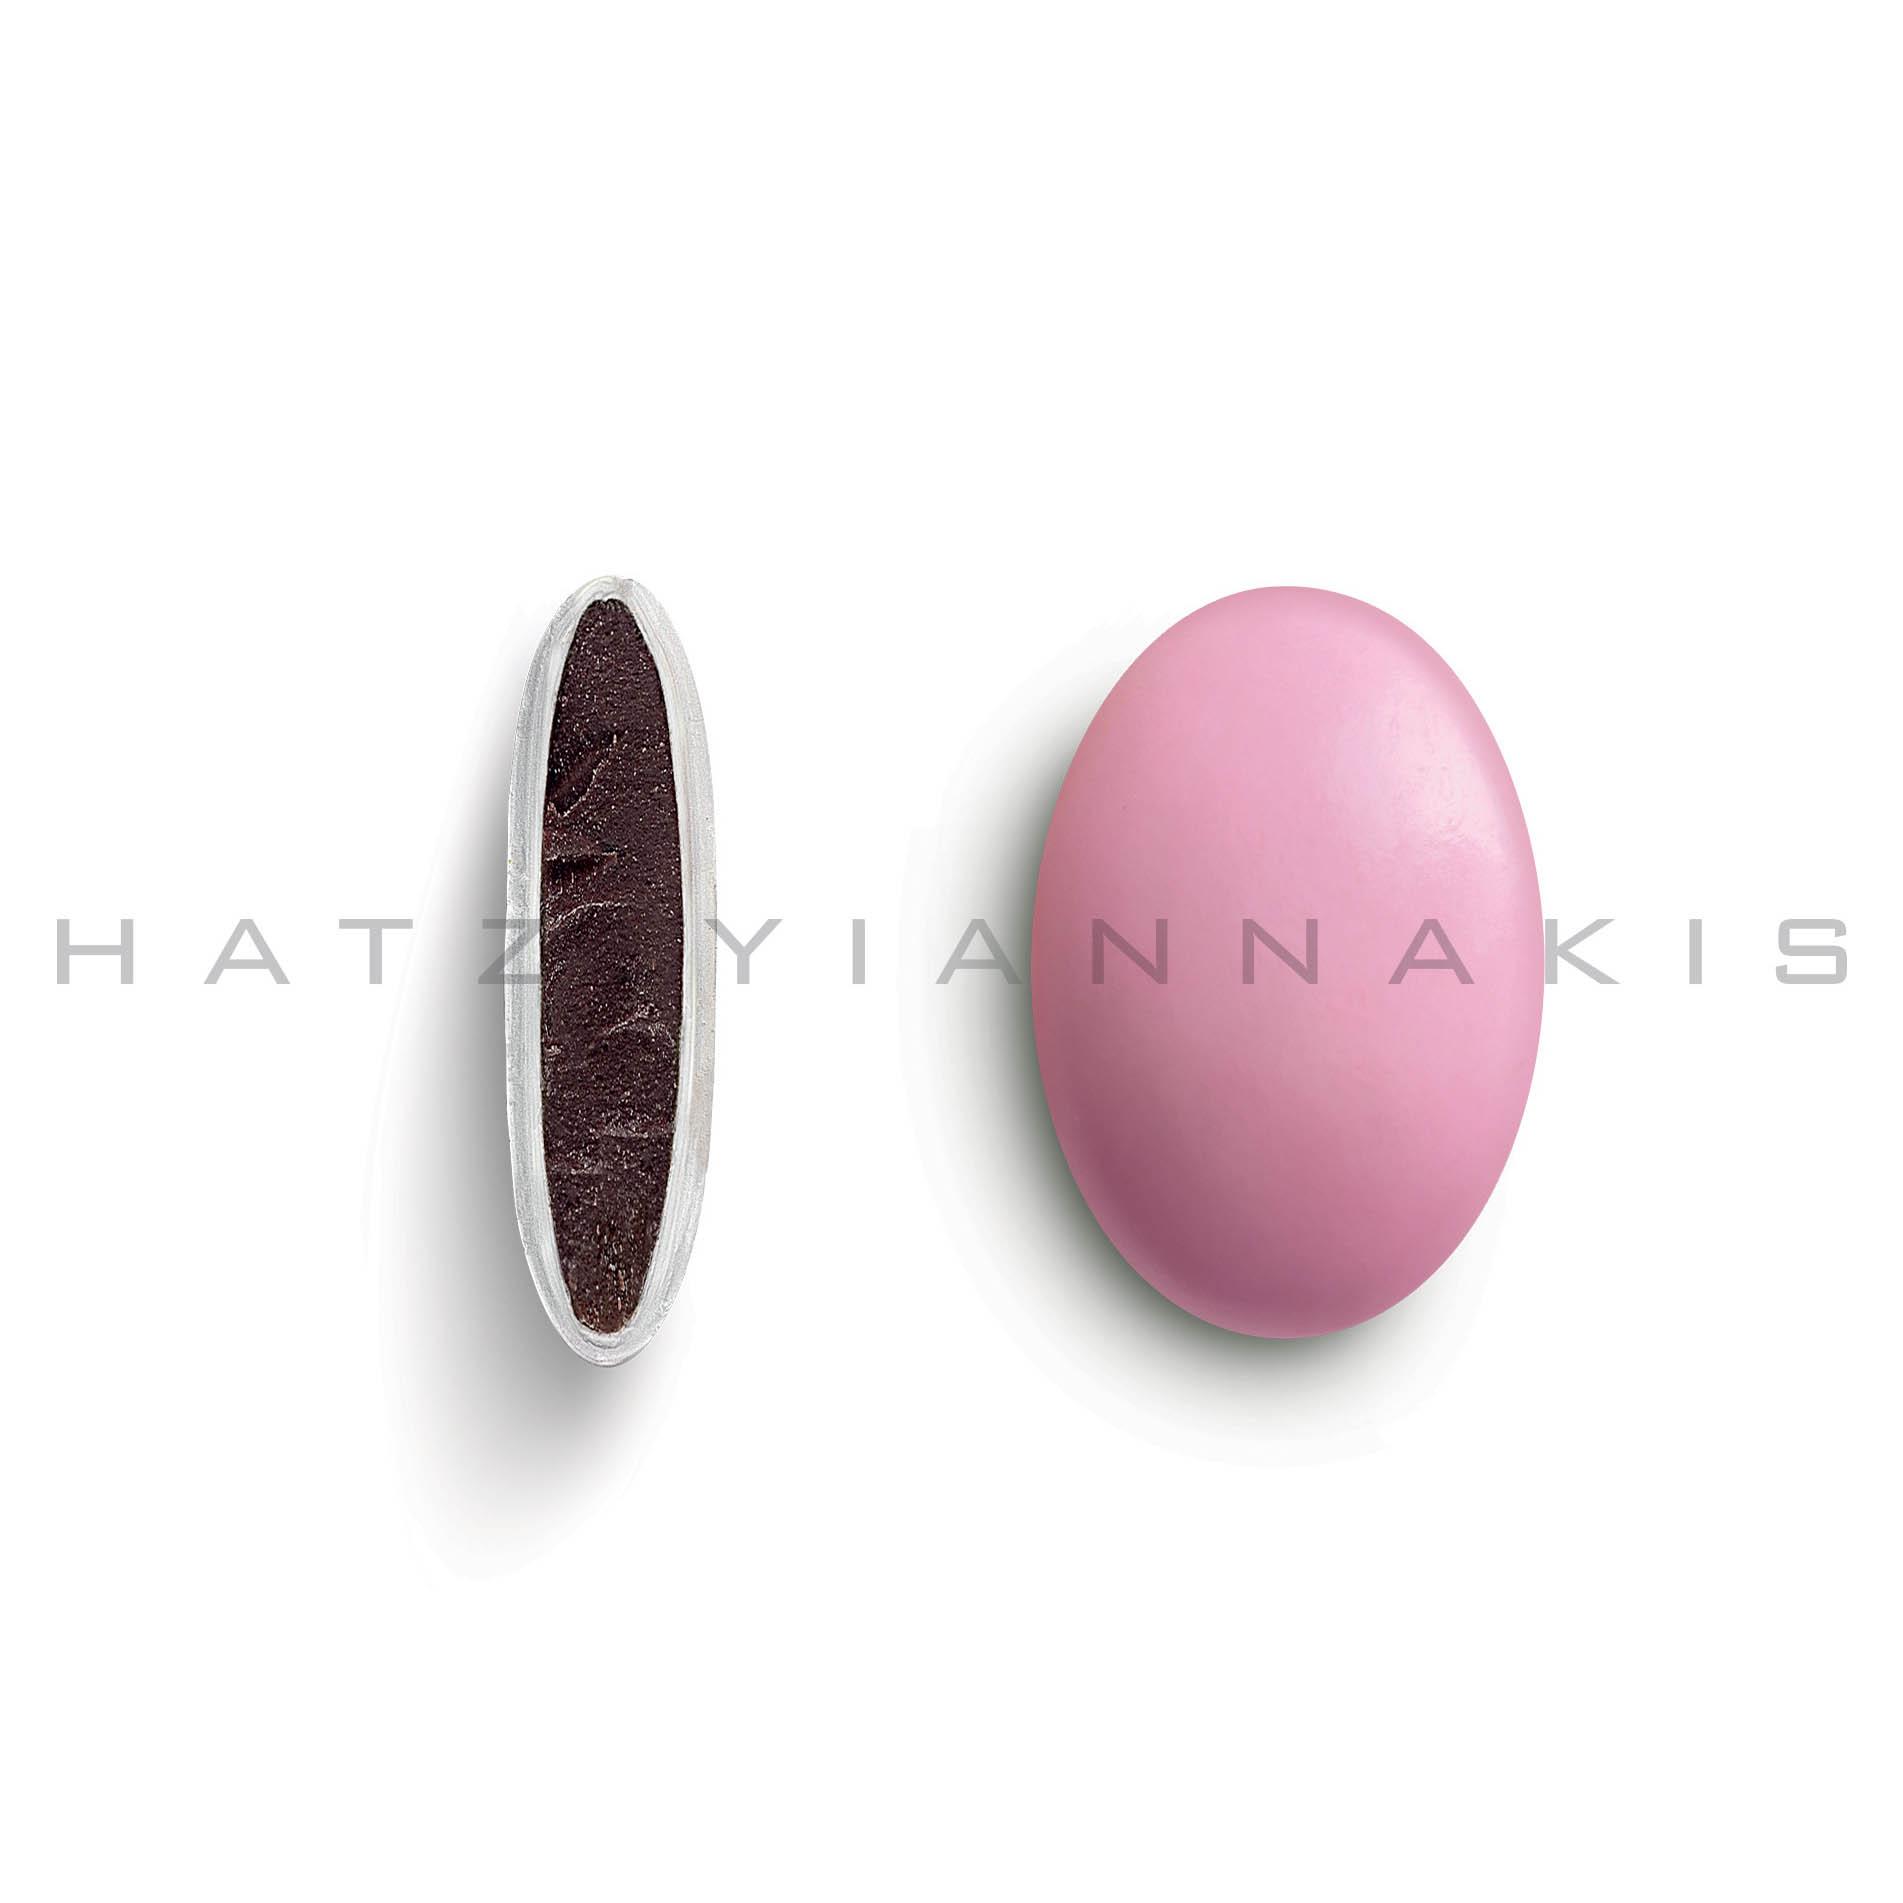 Piccolino κουφέτο χρώμα ροζ ανοιχτό ματ